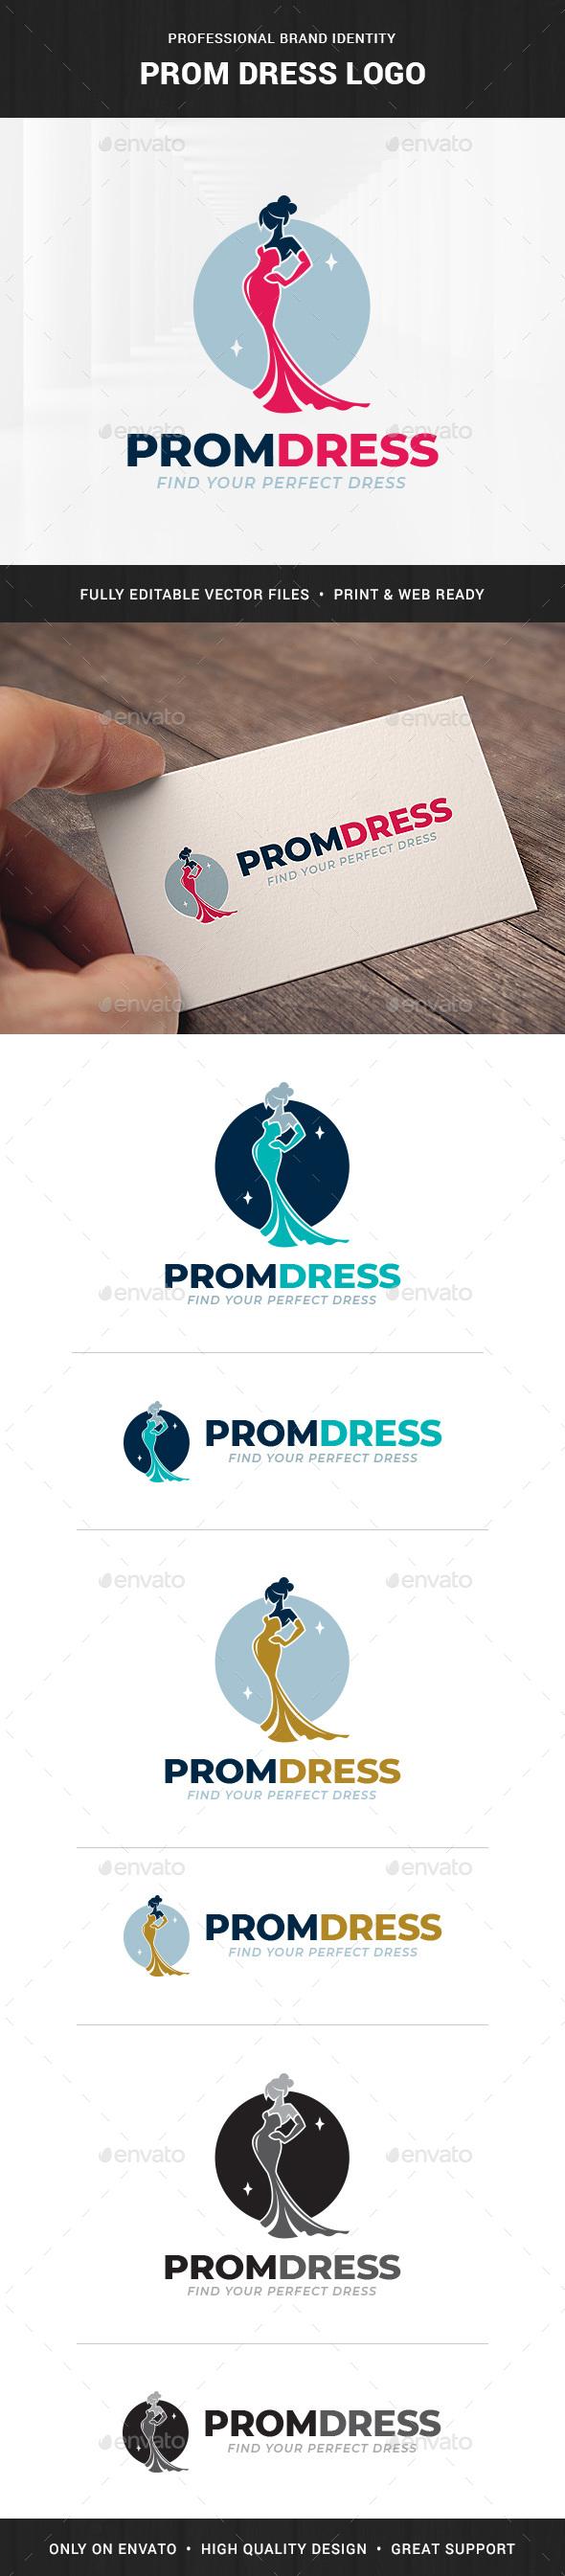 Prom Dress Logo Template